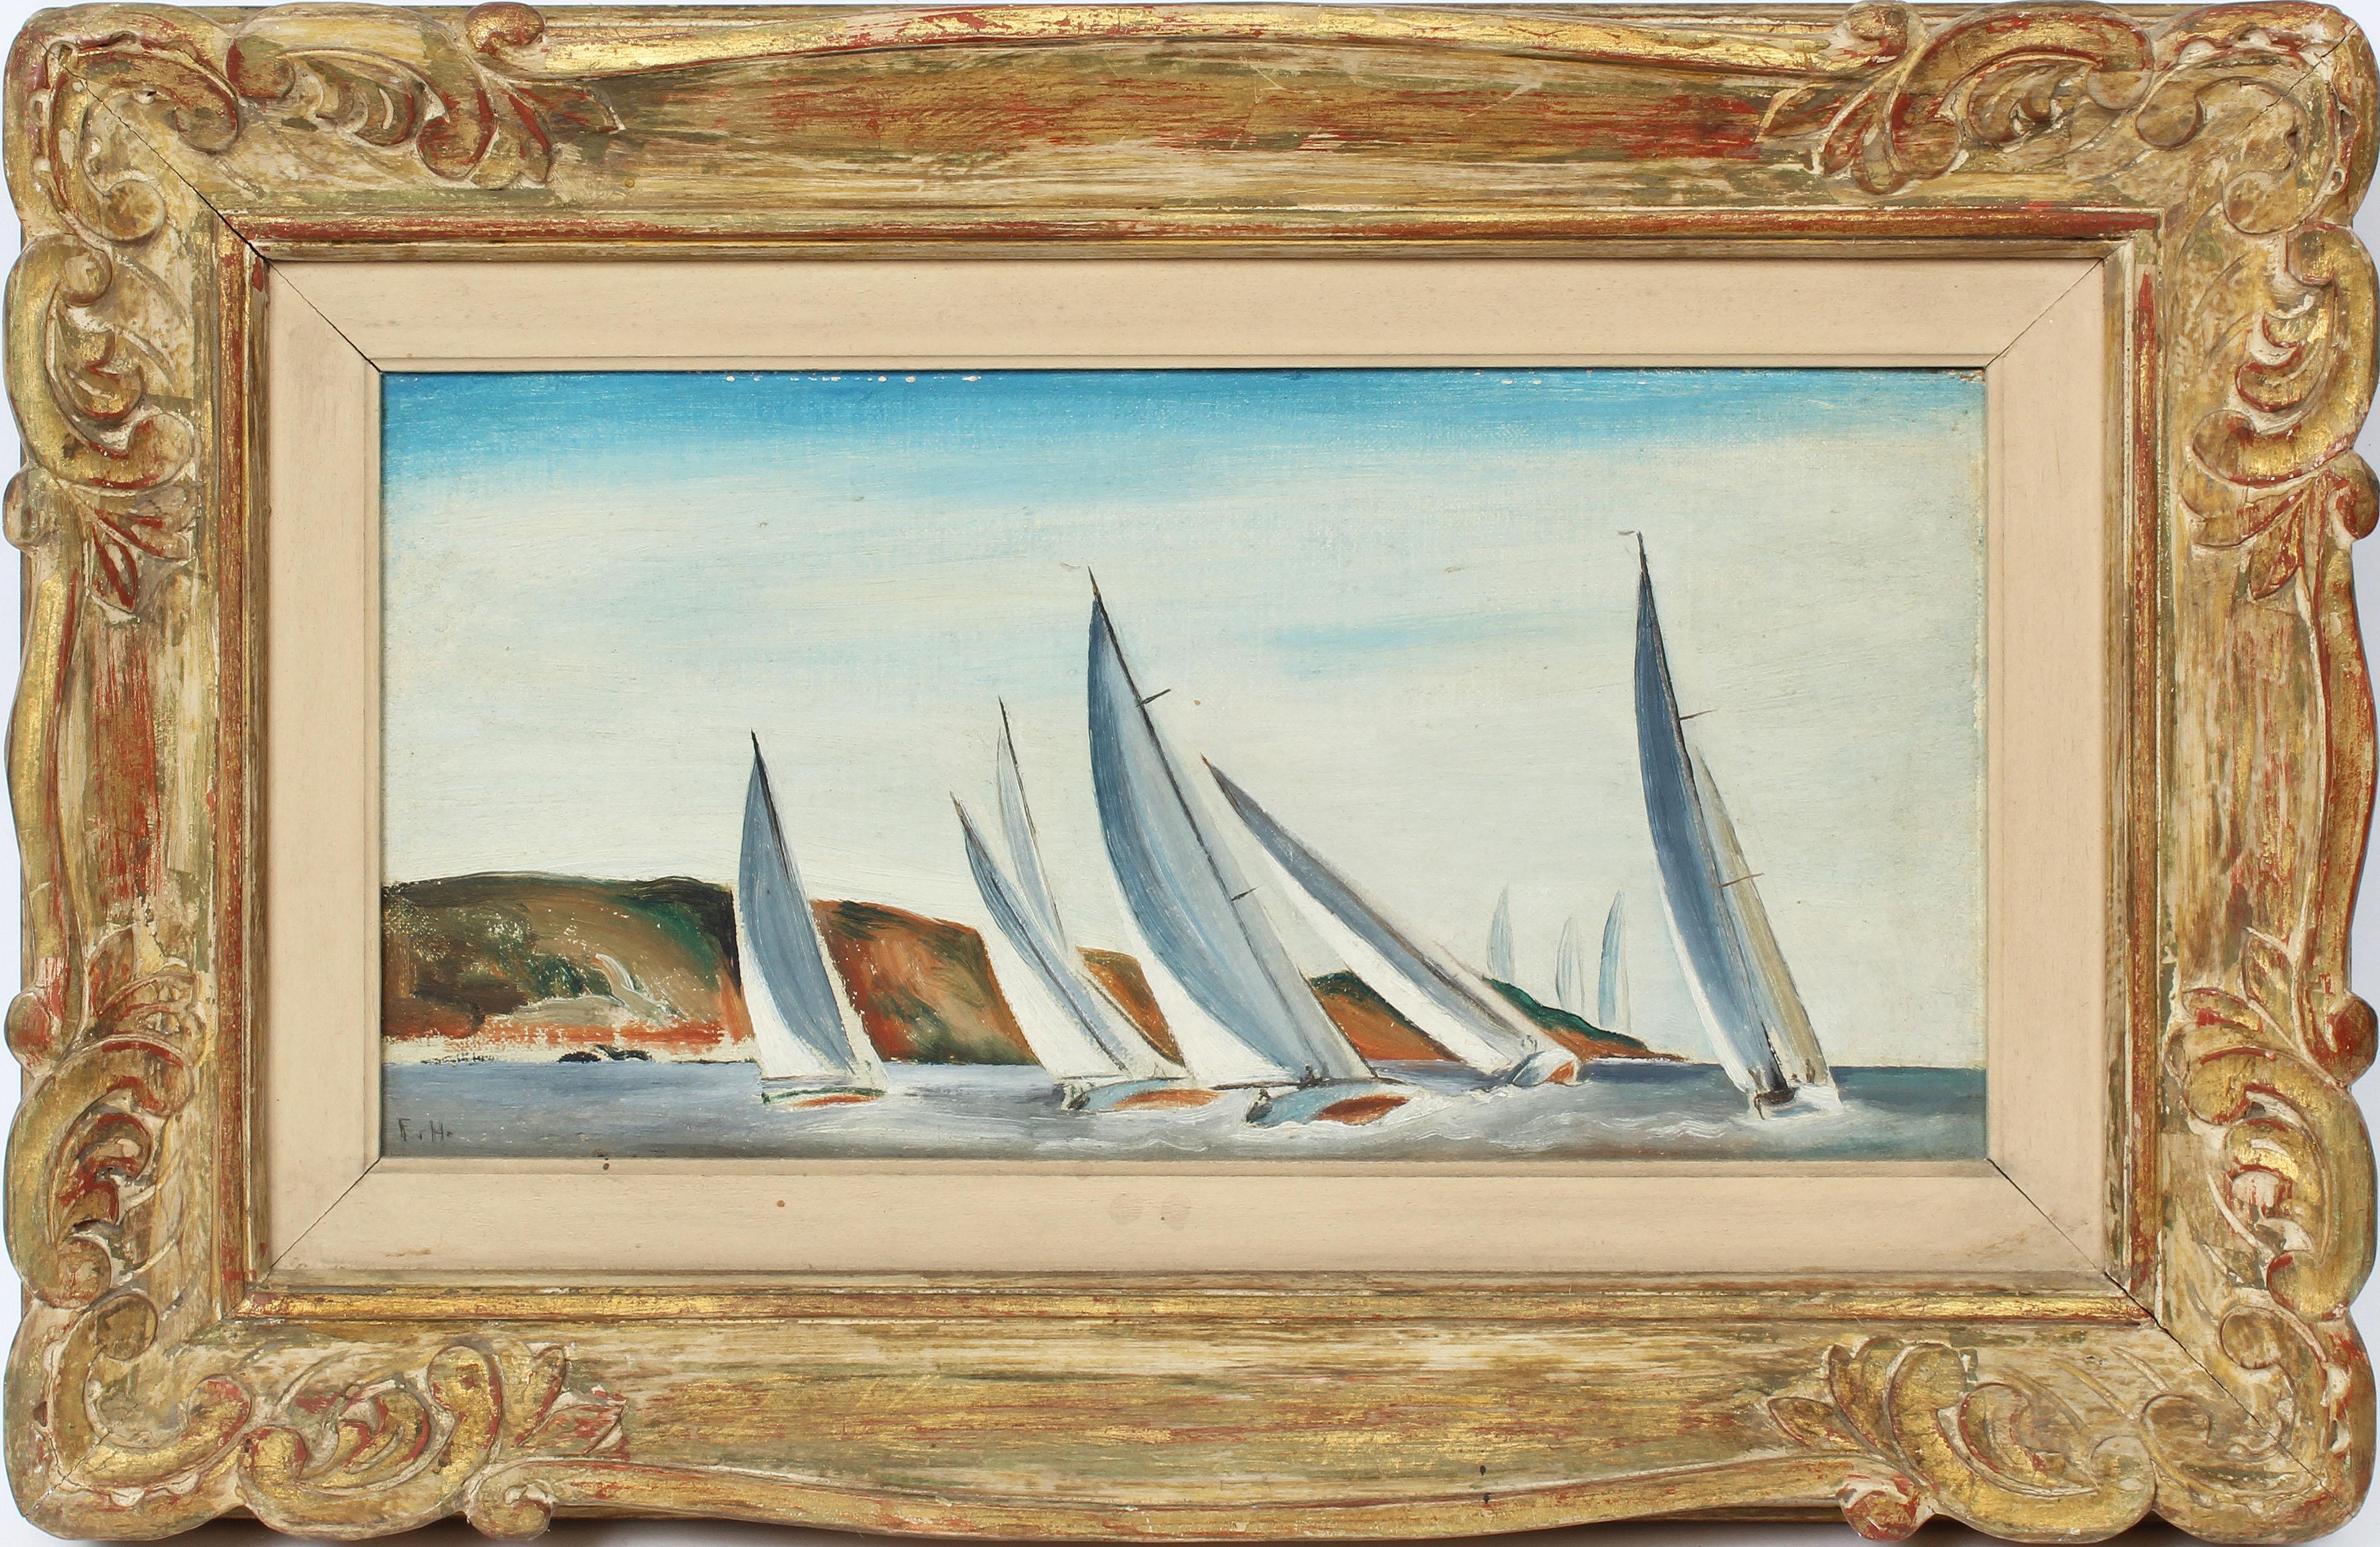 American Female Impressionist St. David's Bermuda Sail Boat Race Oil Painting